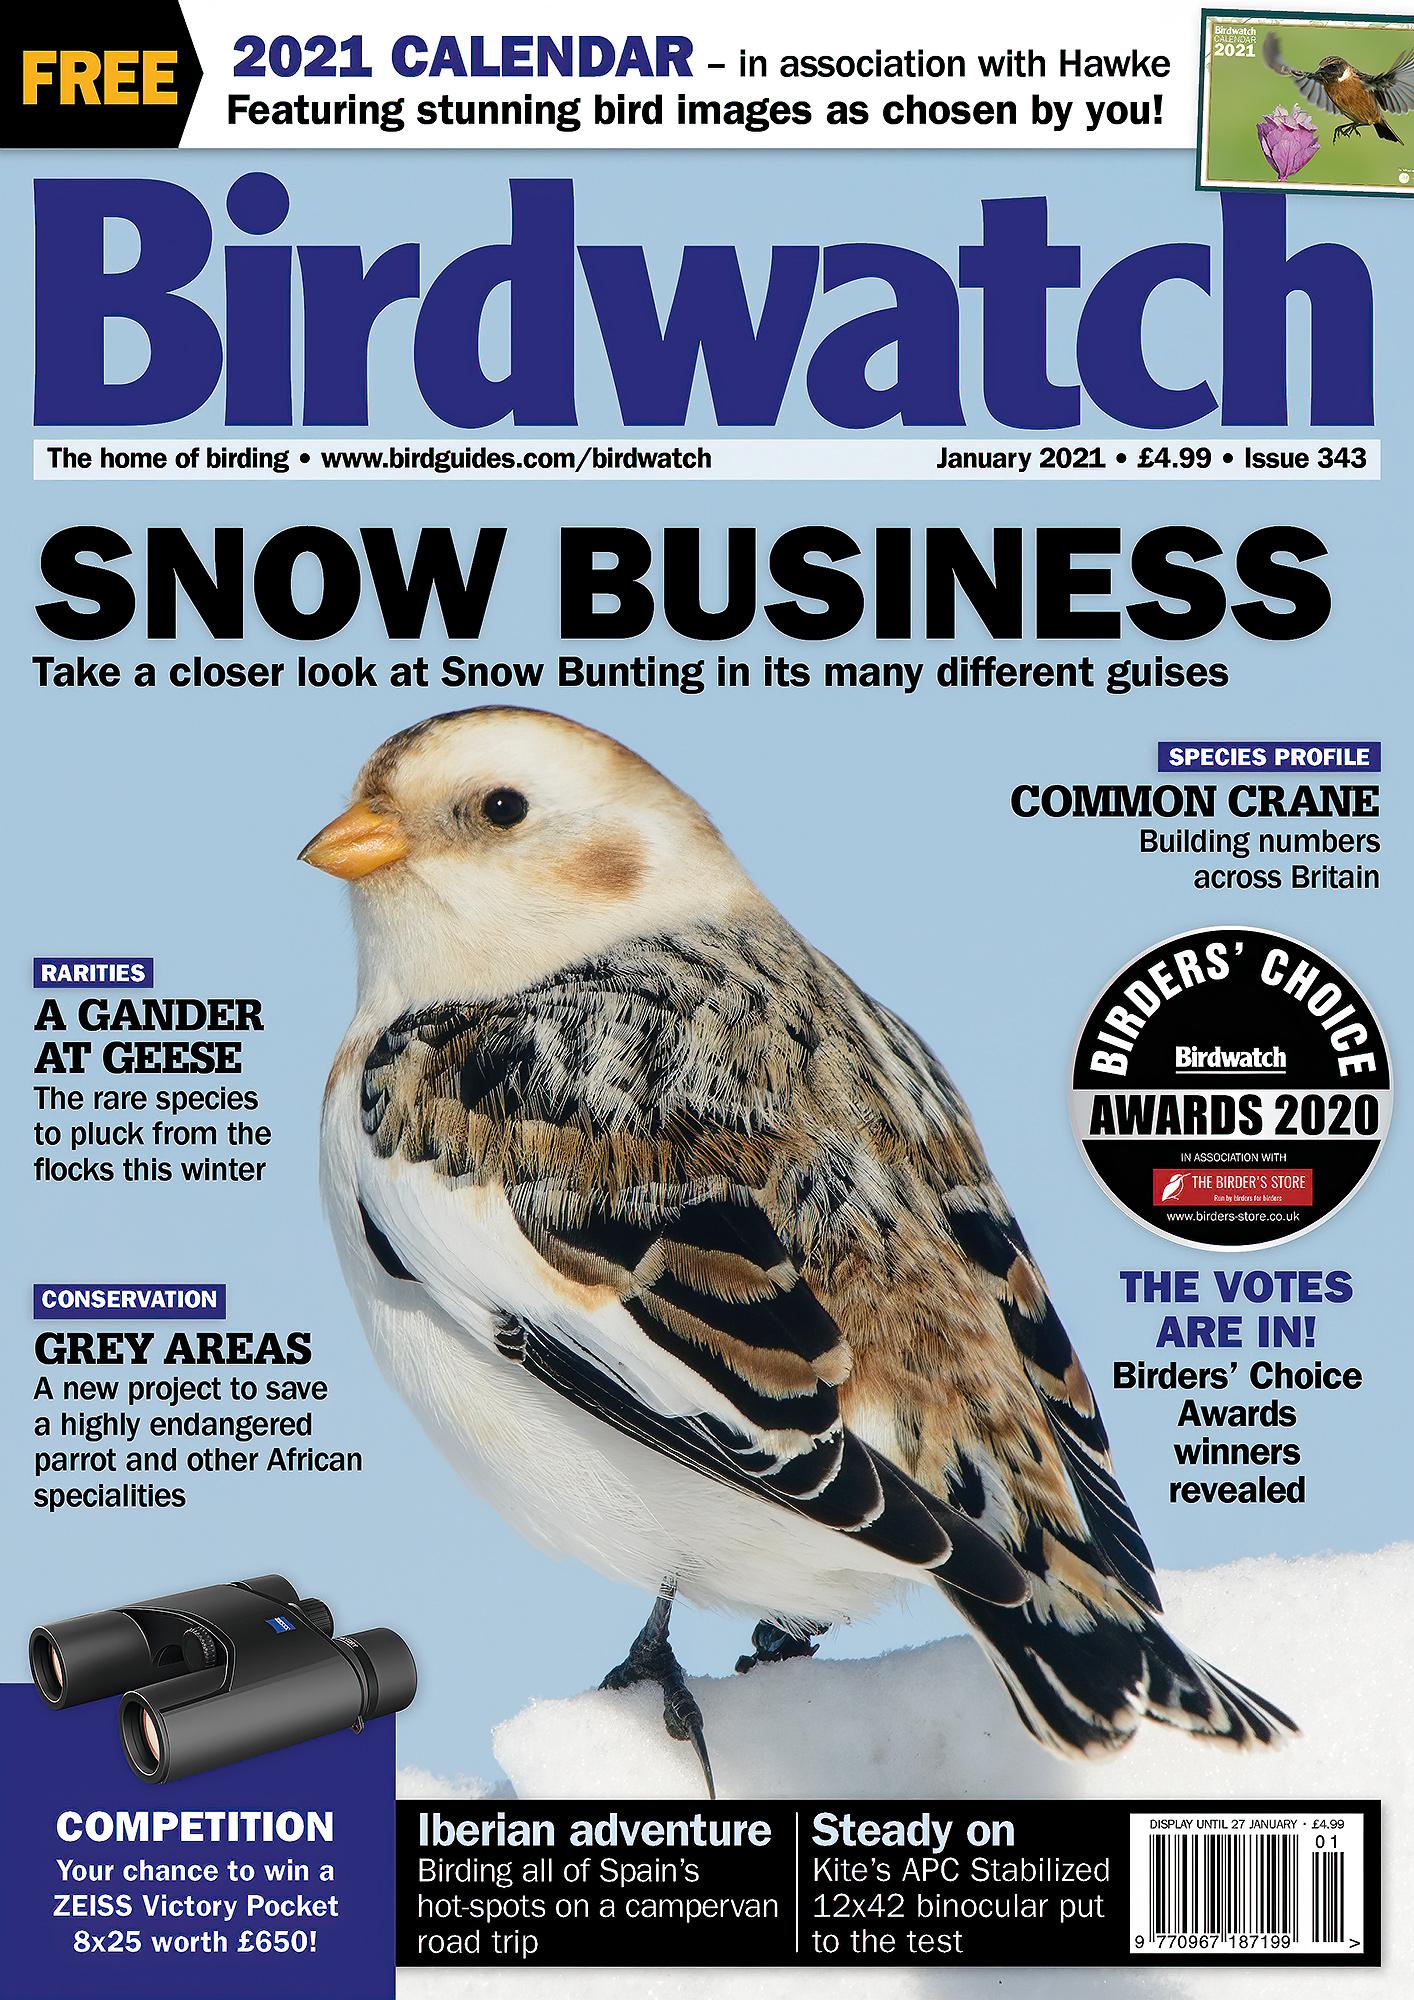 Jan 21 Cover_Birdwatch[1]